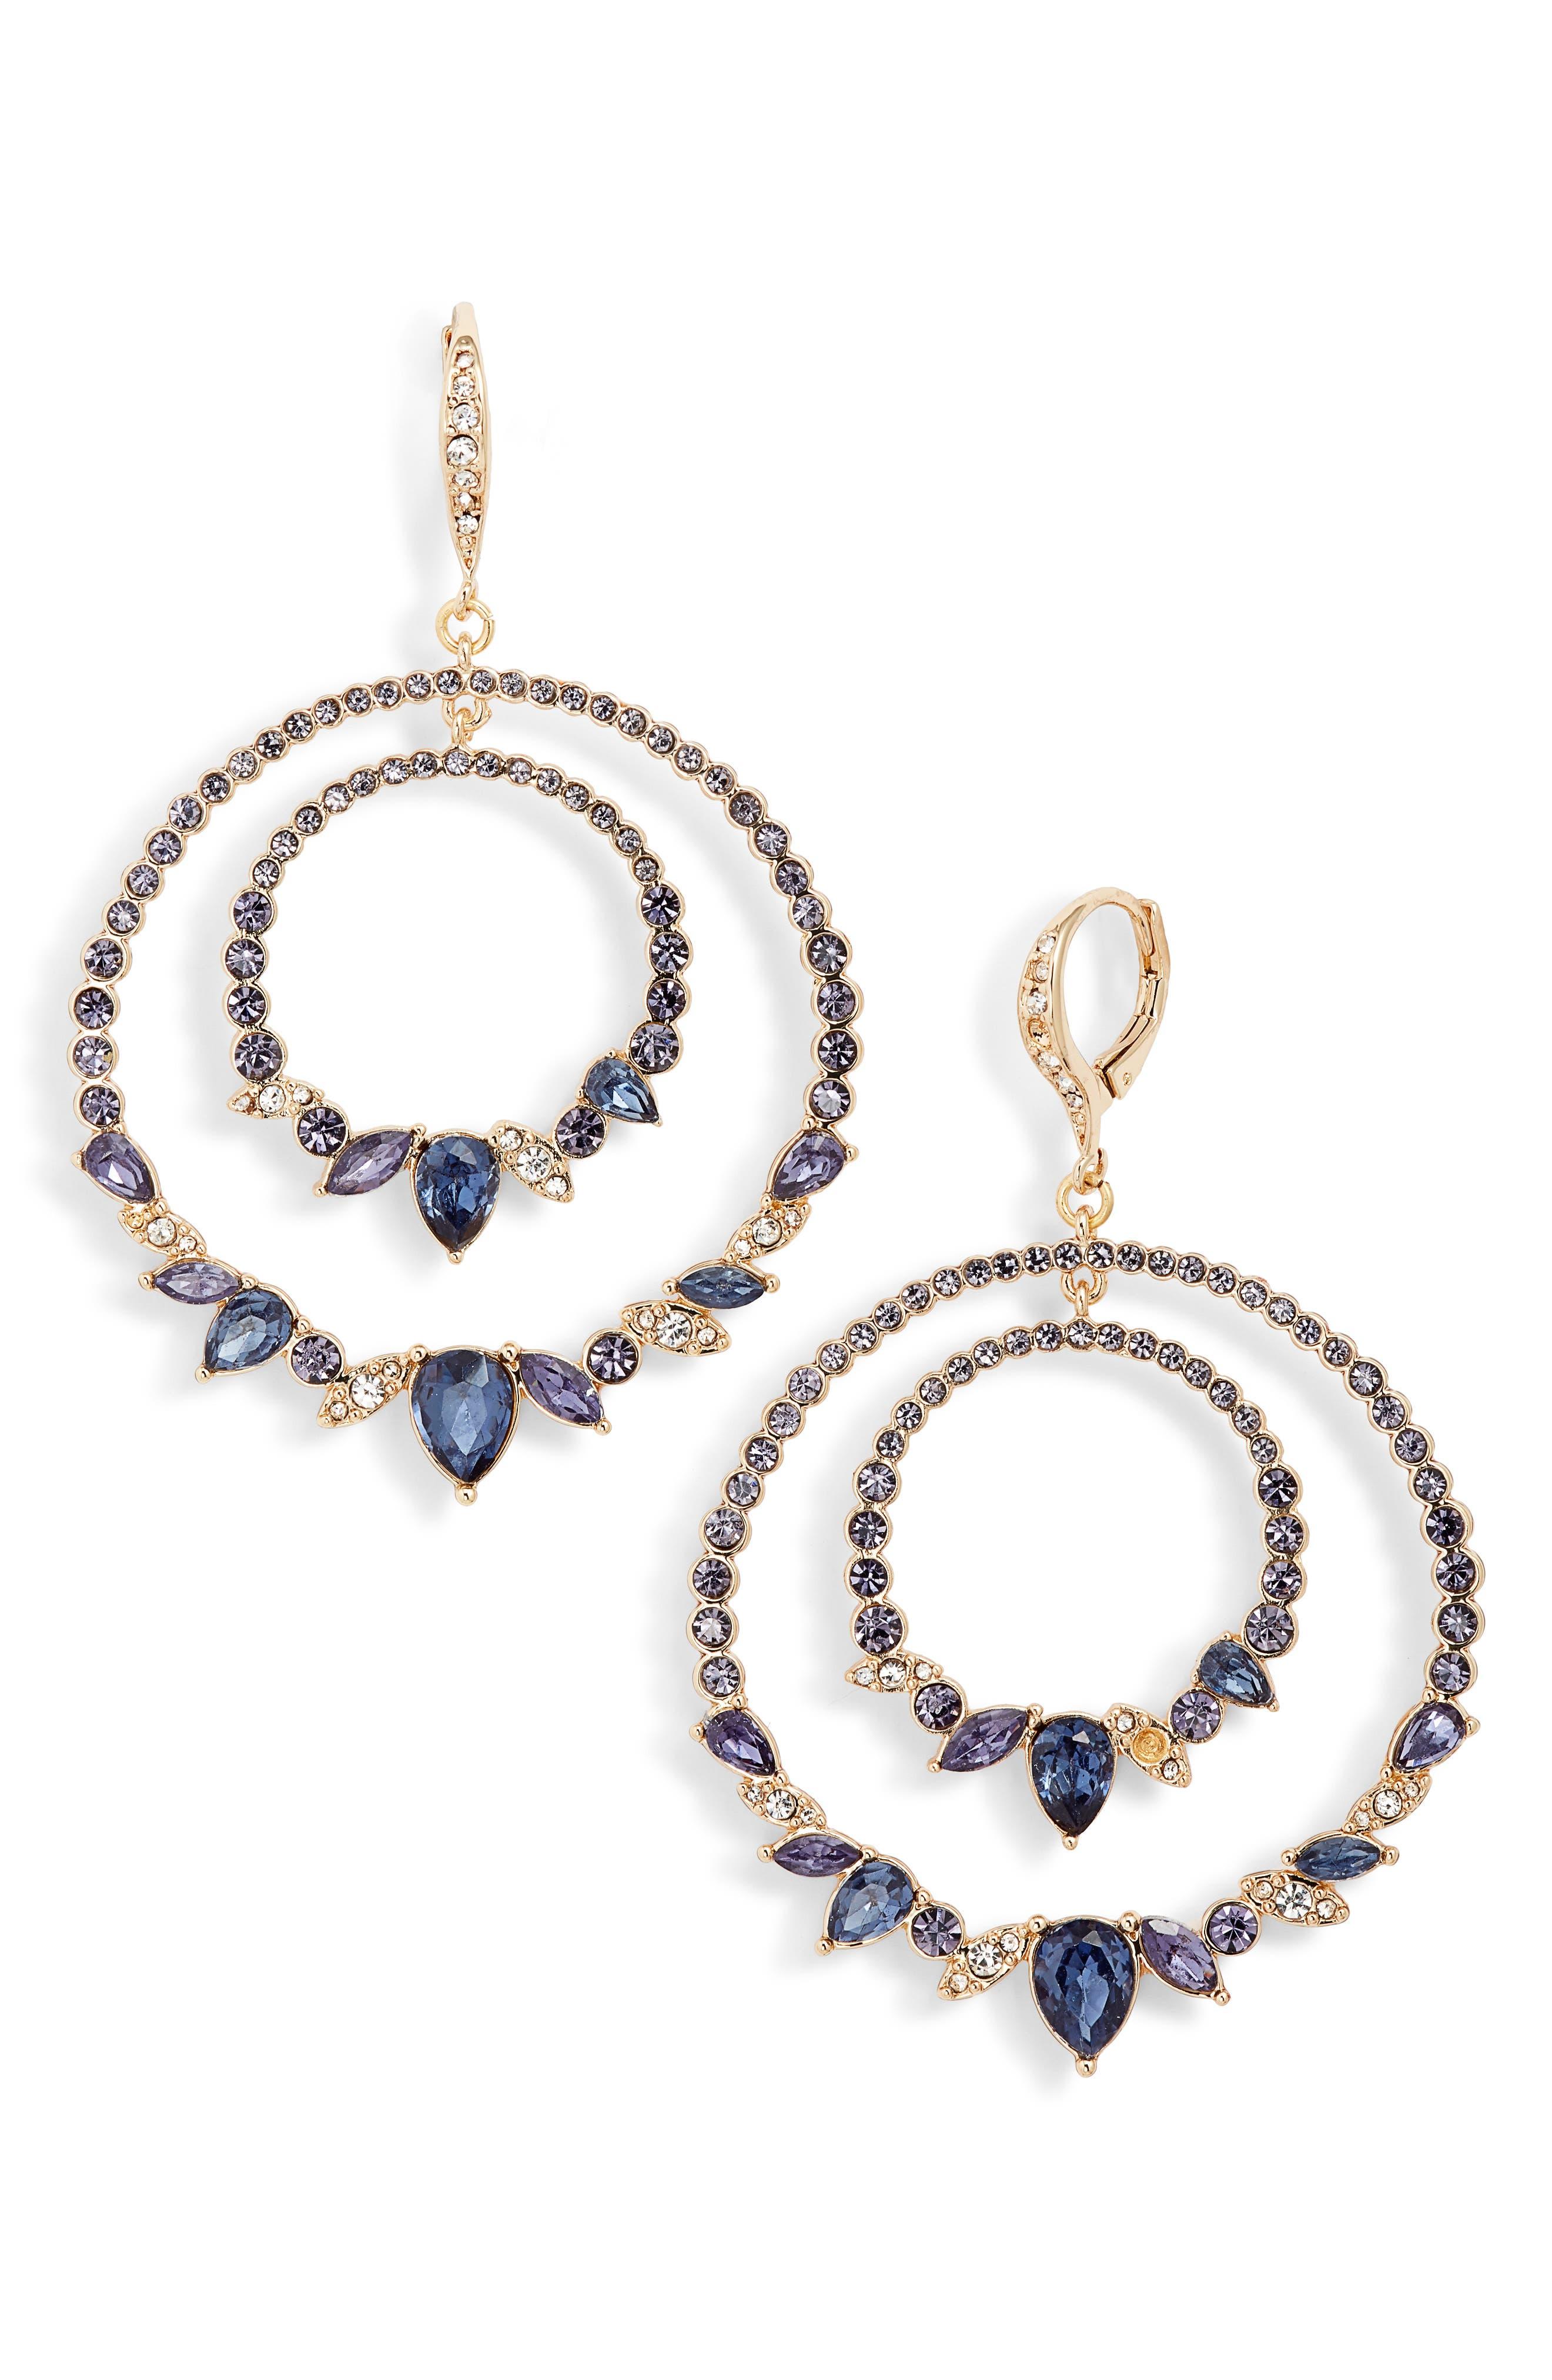 JENNY PACKHAM, Orbital Crystal Drop Earrings, Main thumbnail 1, color, PURPLE/ GOLD